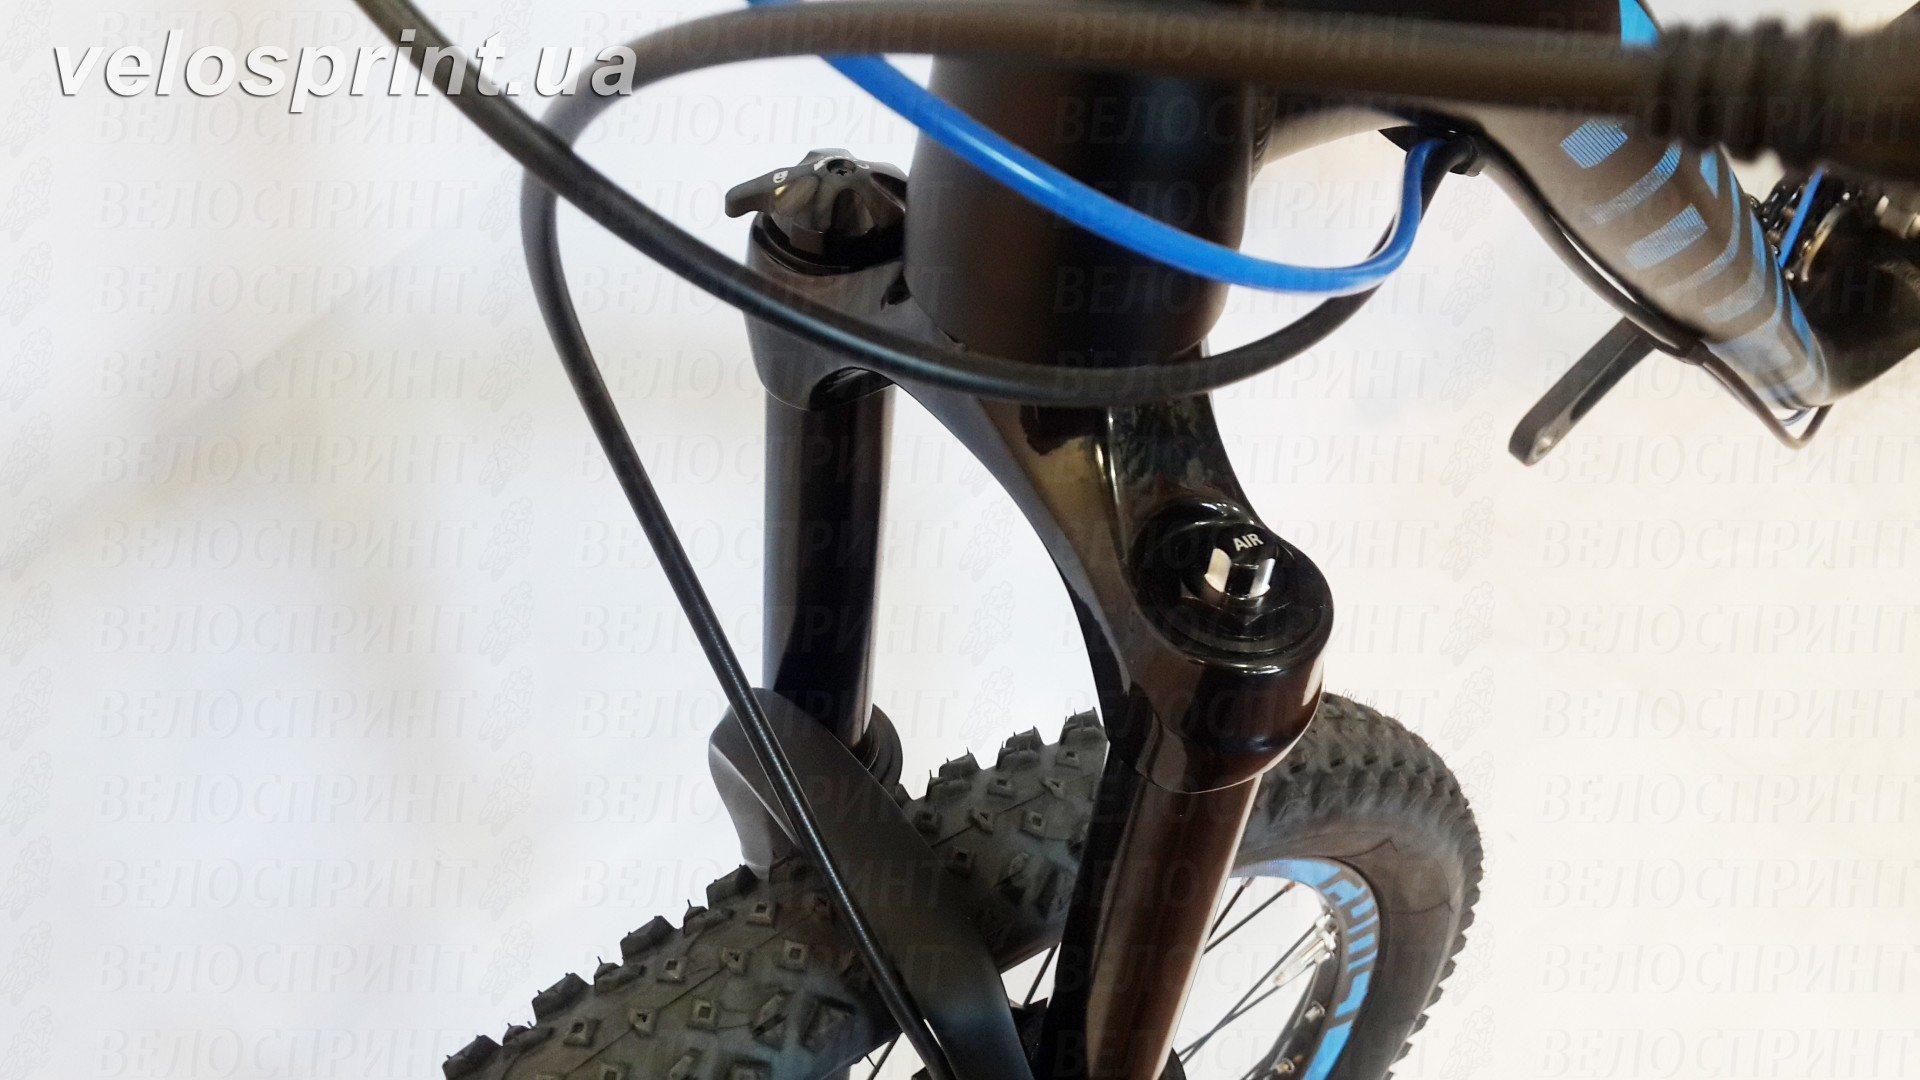 Велосипед GHOST Kato FS 2 AL 27.5 nightblack/riotblue/monarchorange вилка год 2017